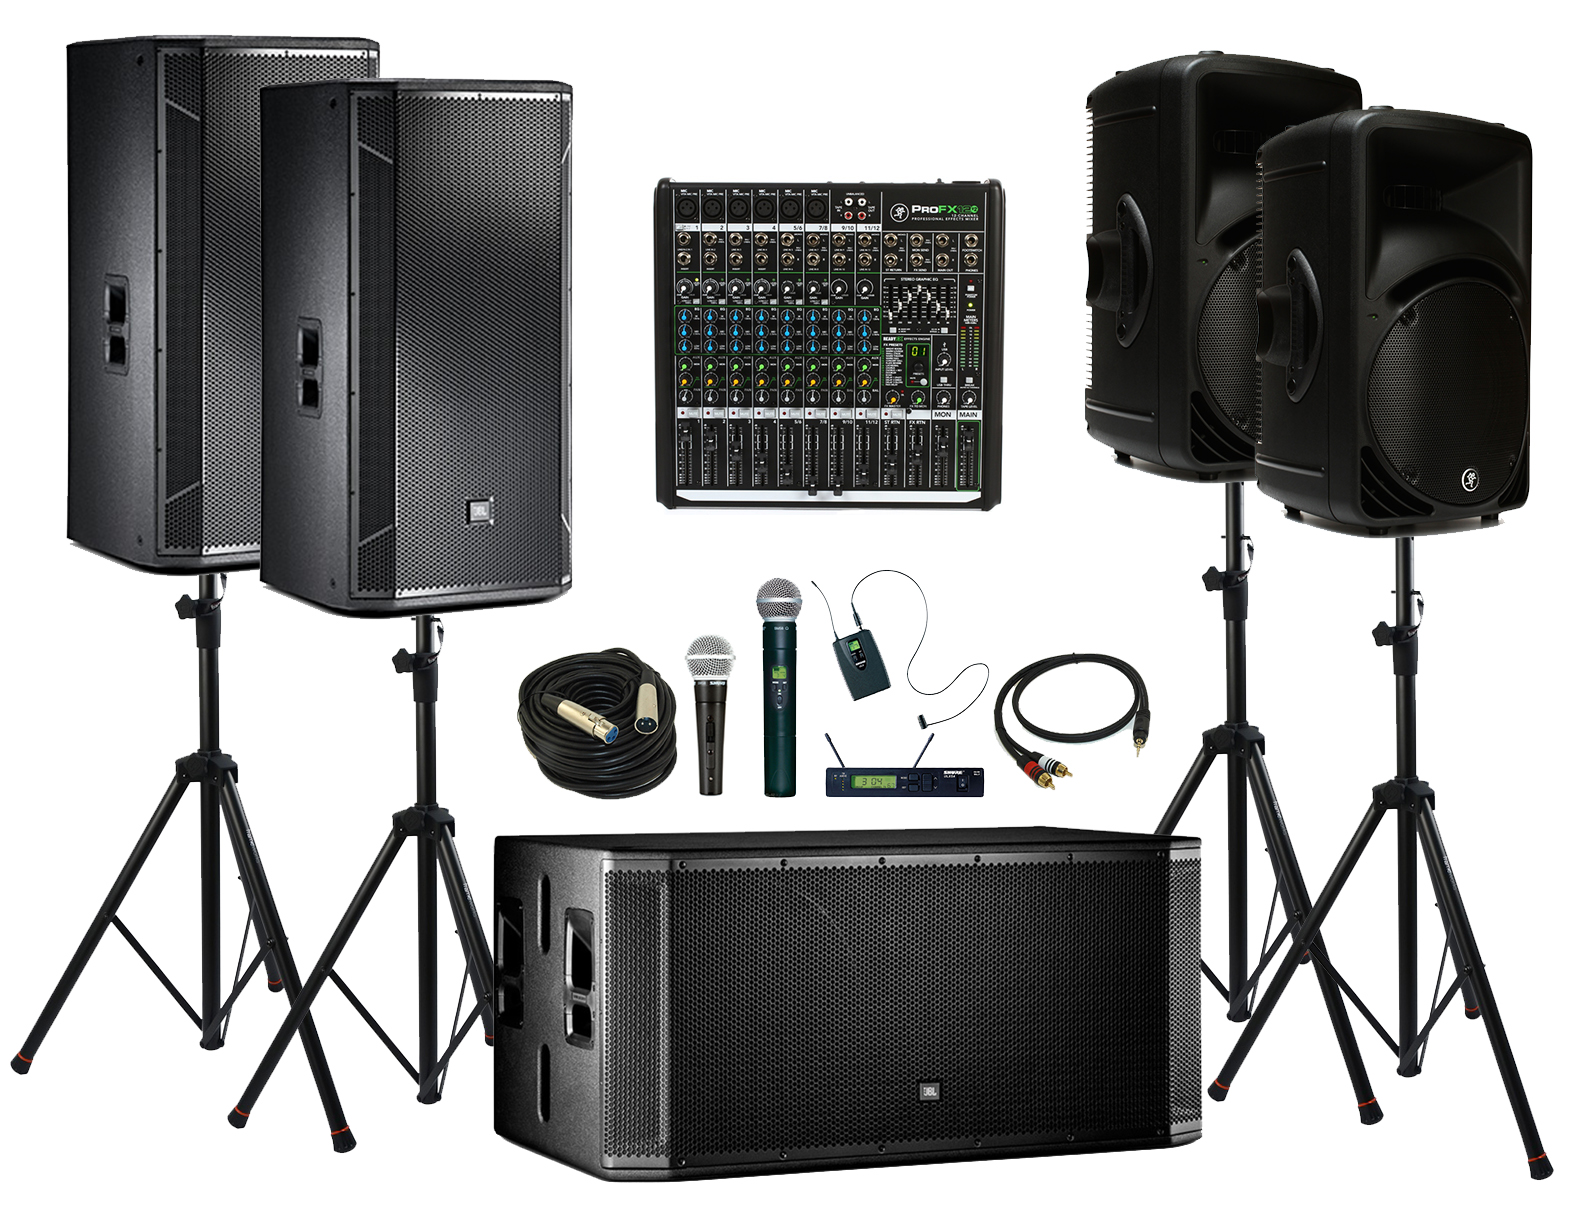 event microphone and speaker rental in kansas city topeka st joseph